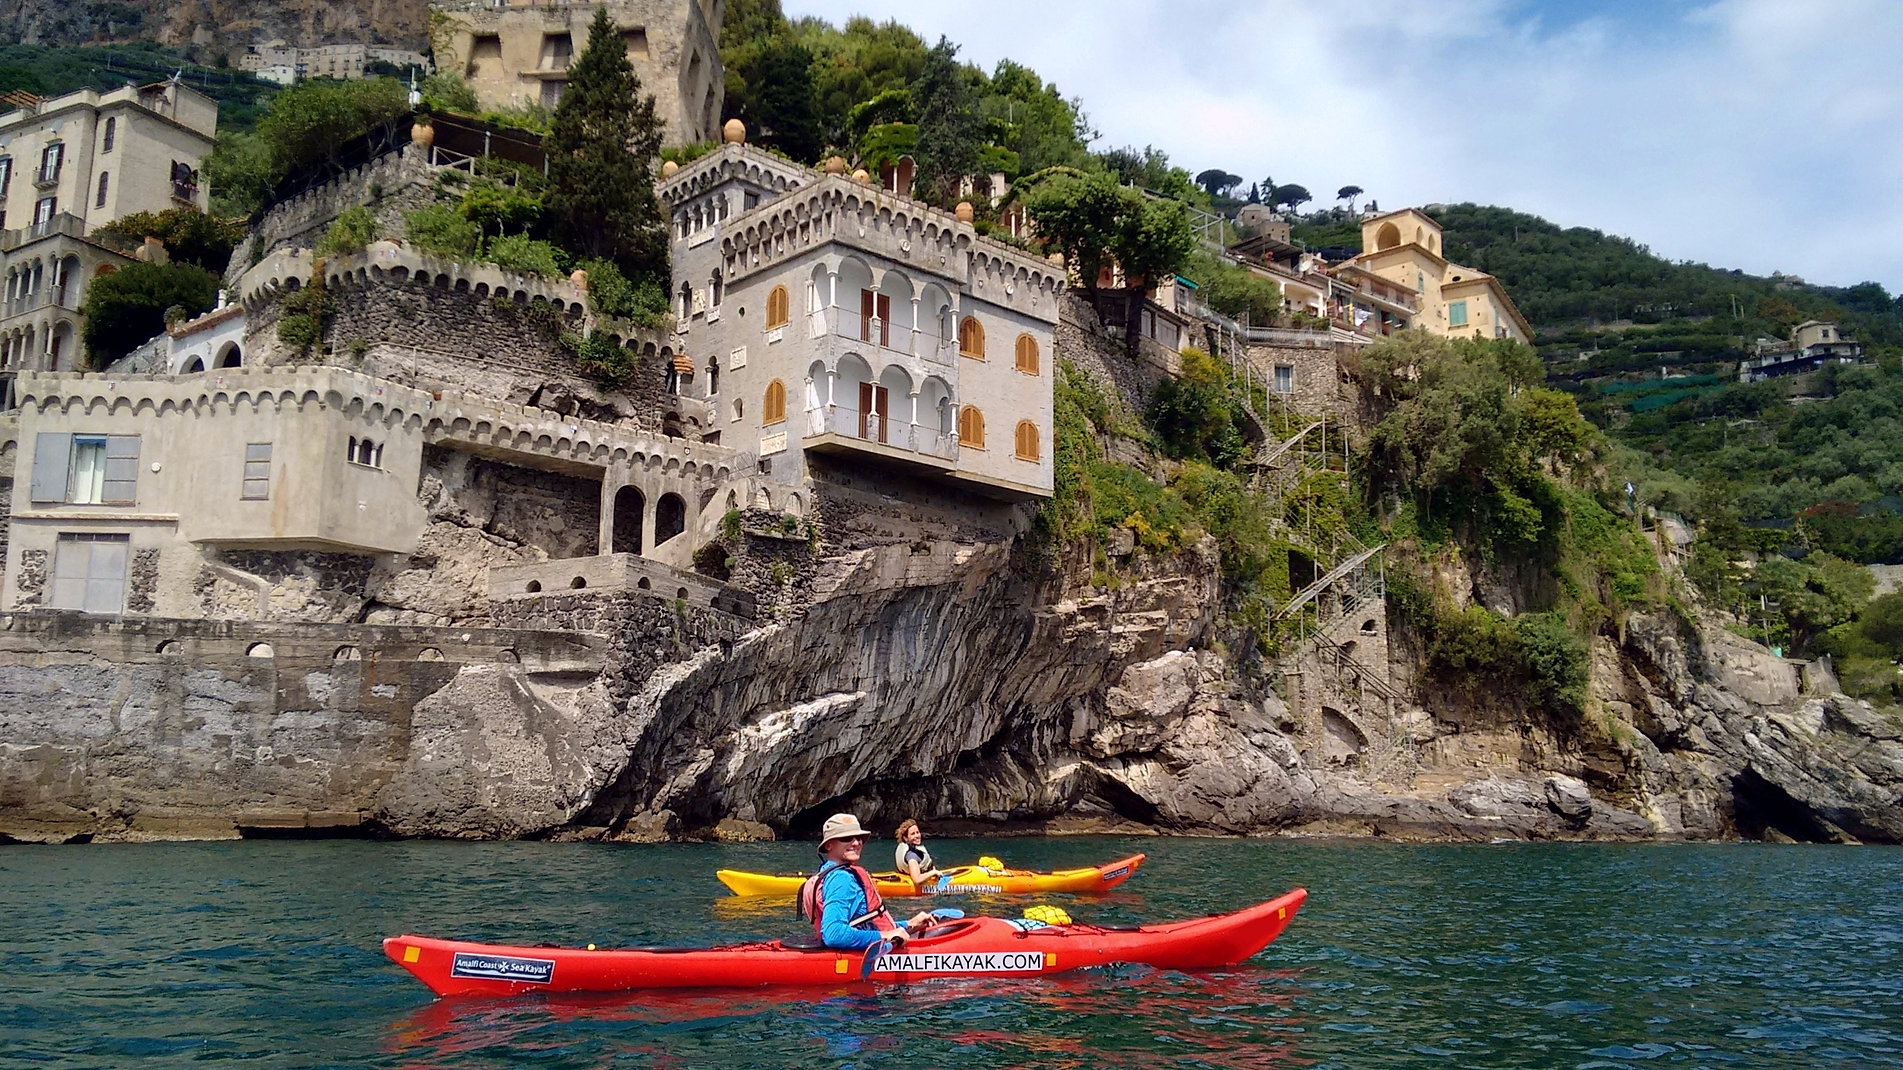 Amalfi maiori escursioni in kayak da mare in costiera - Bagni lido andora ...